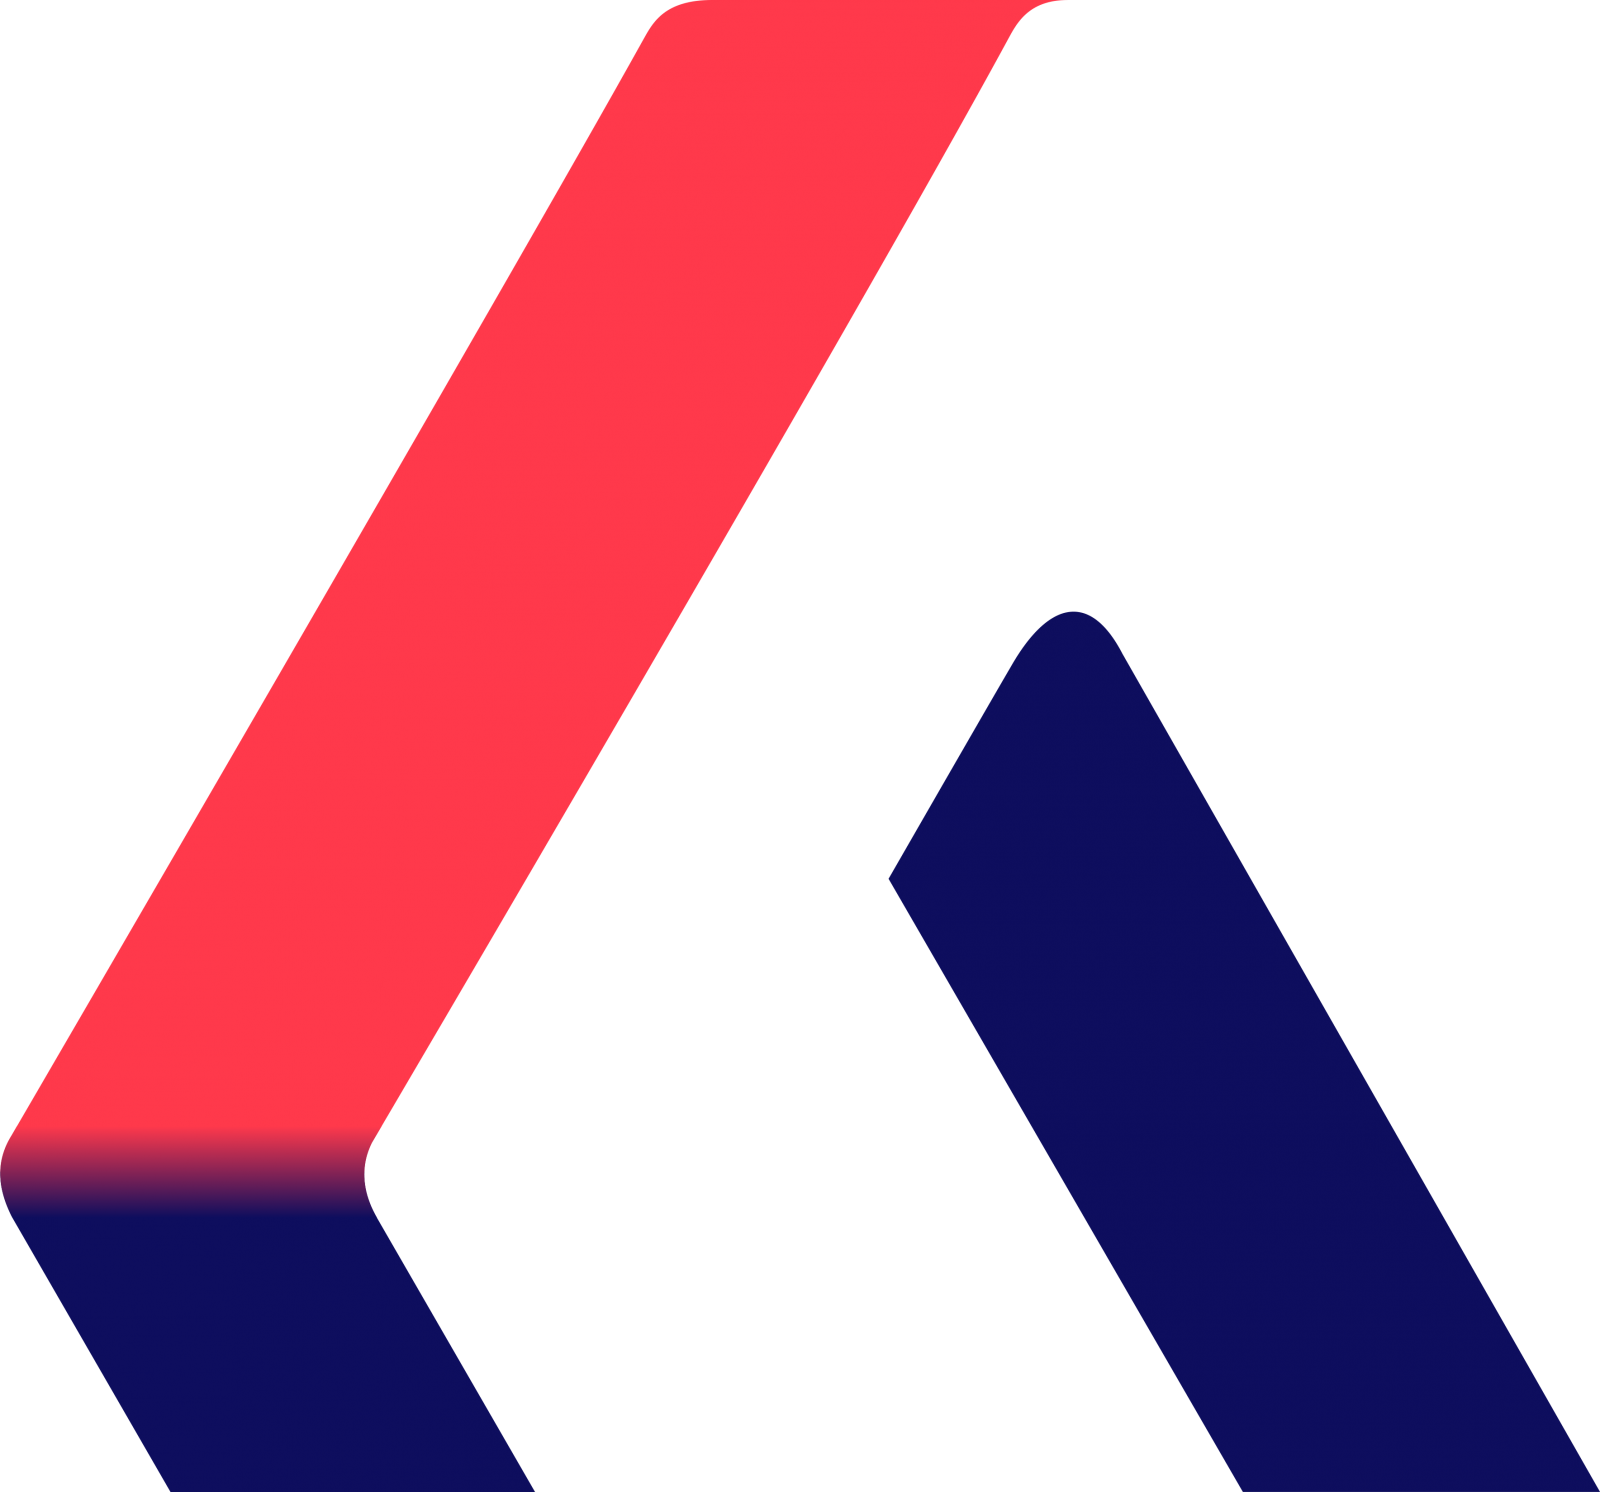 Designpreis AIDA 2021